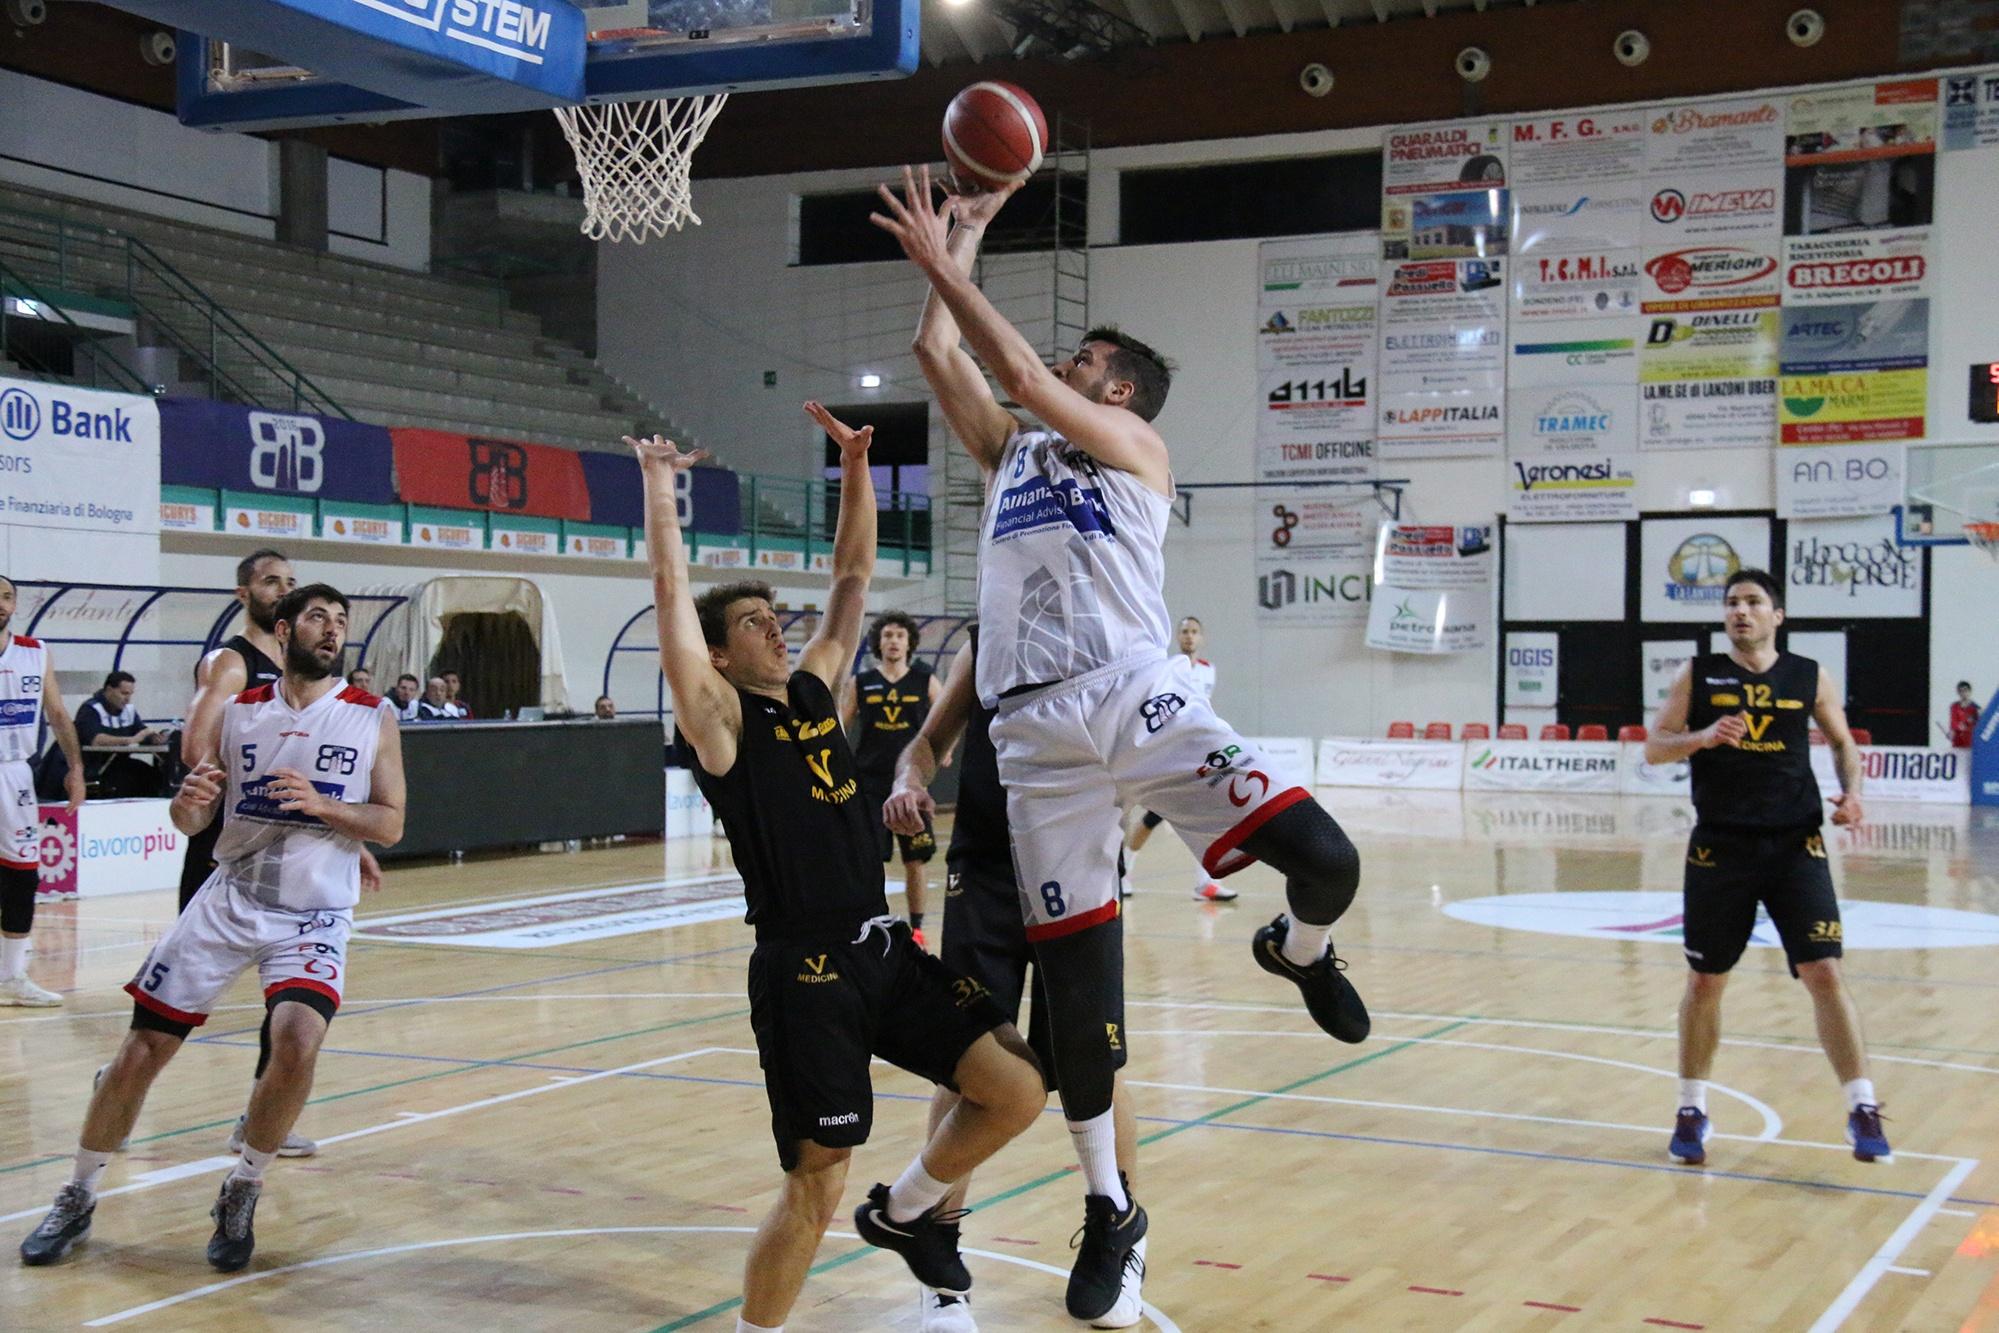 Riprende la marcia vincente del Bologna Basket 2016